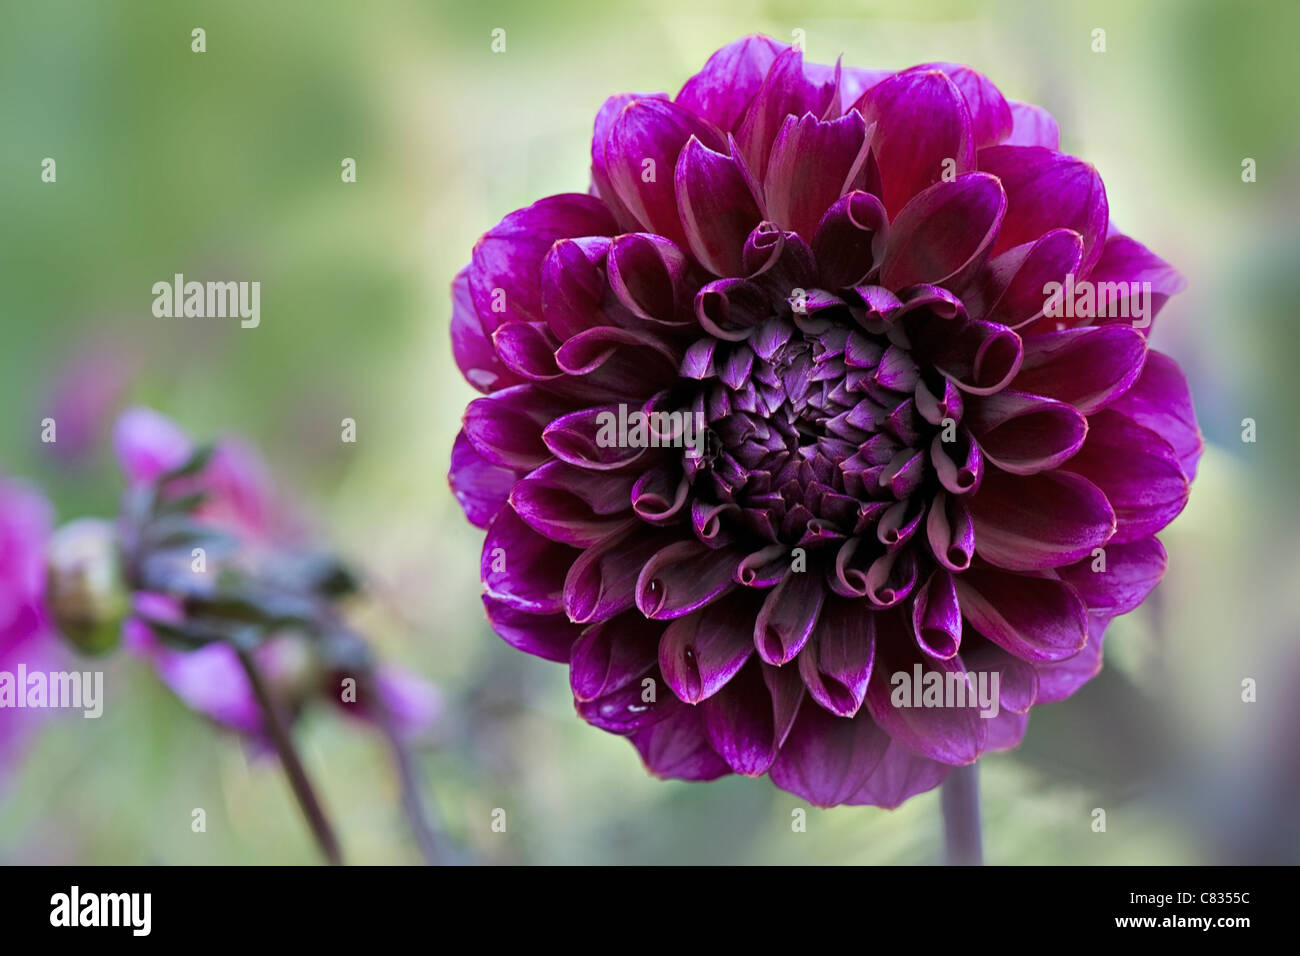 Purple Chrysanthemum flower - Stock Image